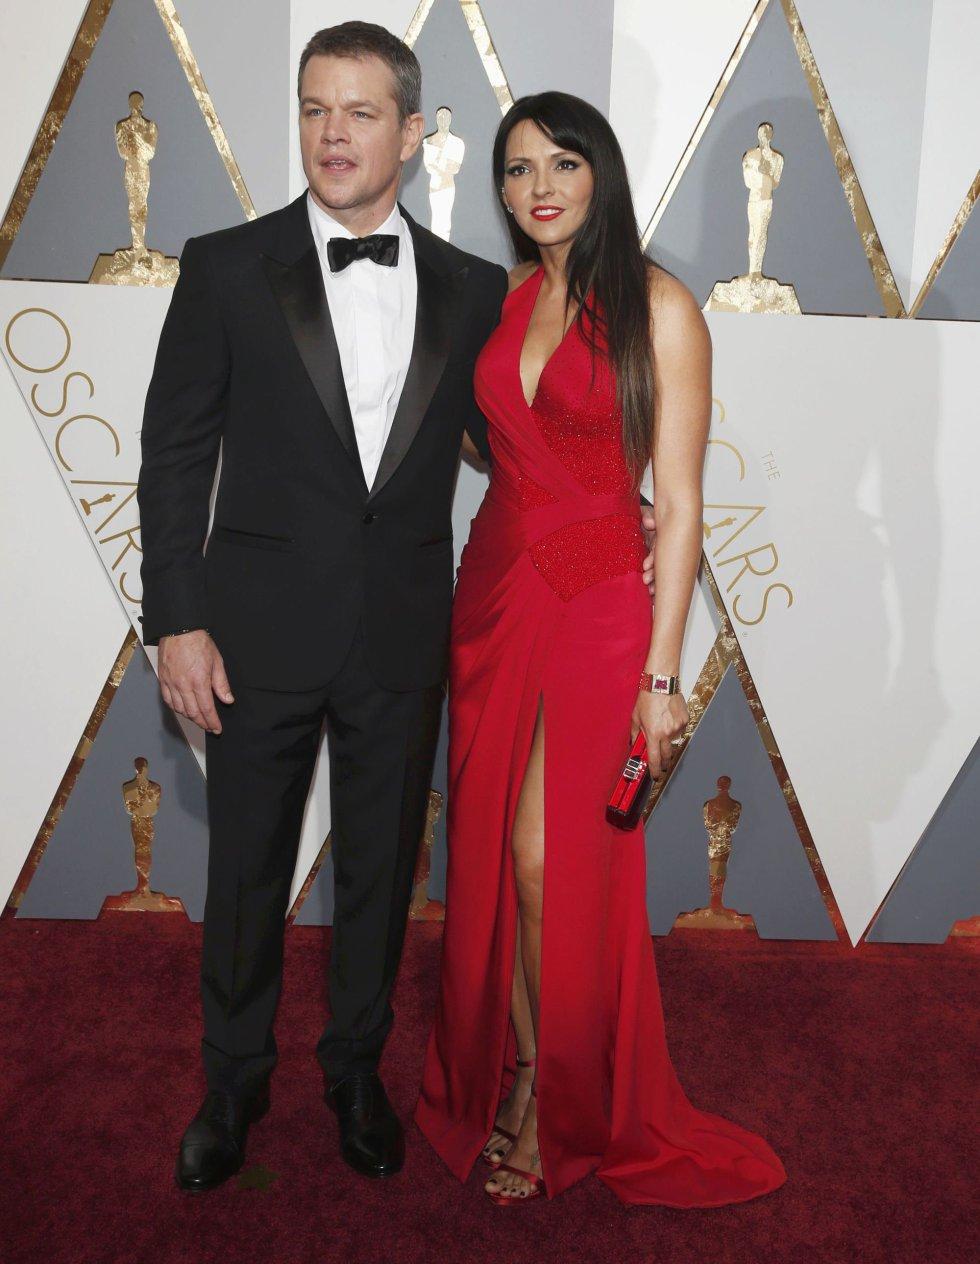 Matt Damon, nominado a mejor actor por 'Marte'